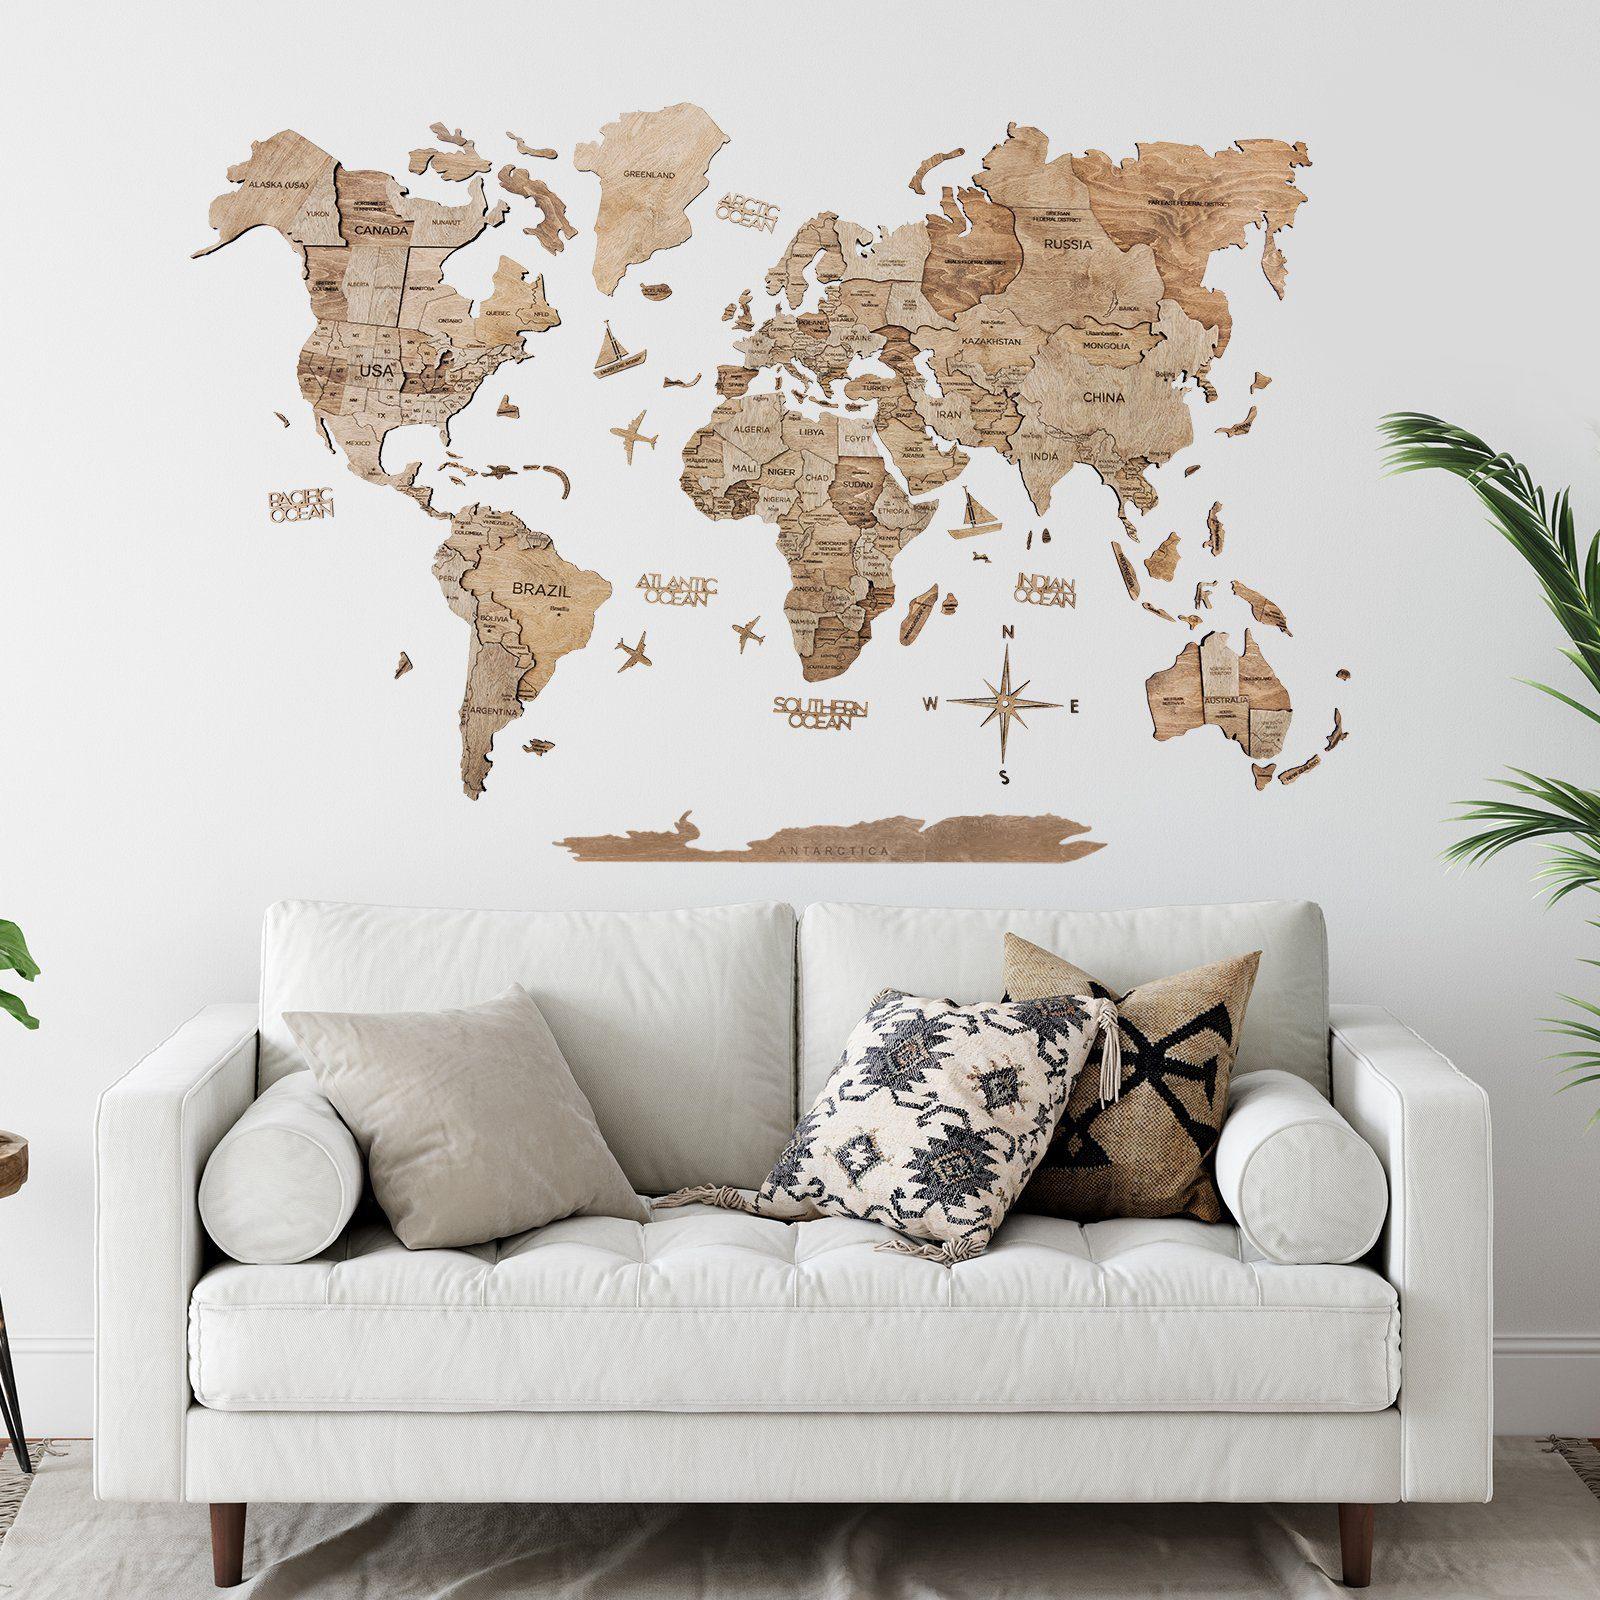 Enjoy the Wood 3D World Map